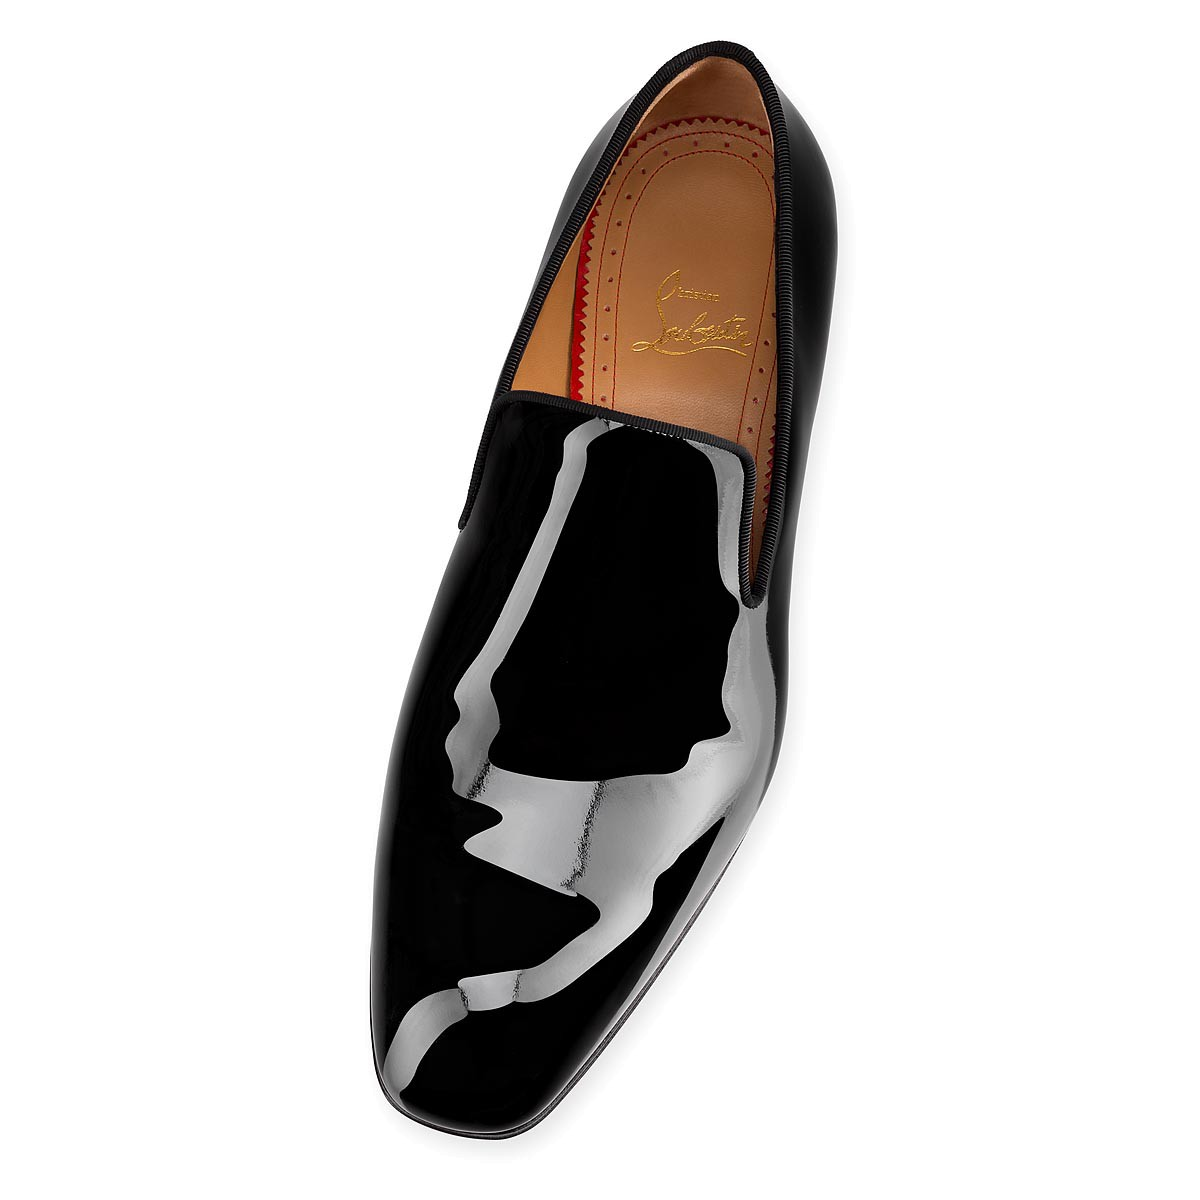 Shoes - Colonnaki - Christian Louboutin